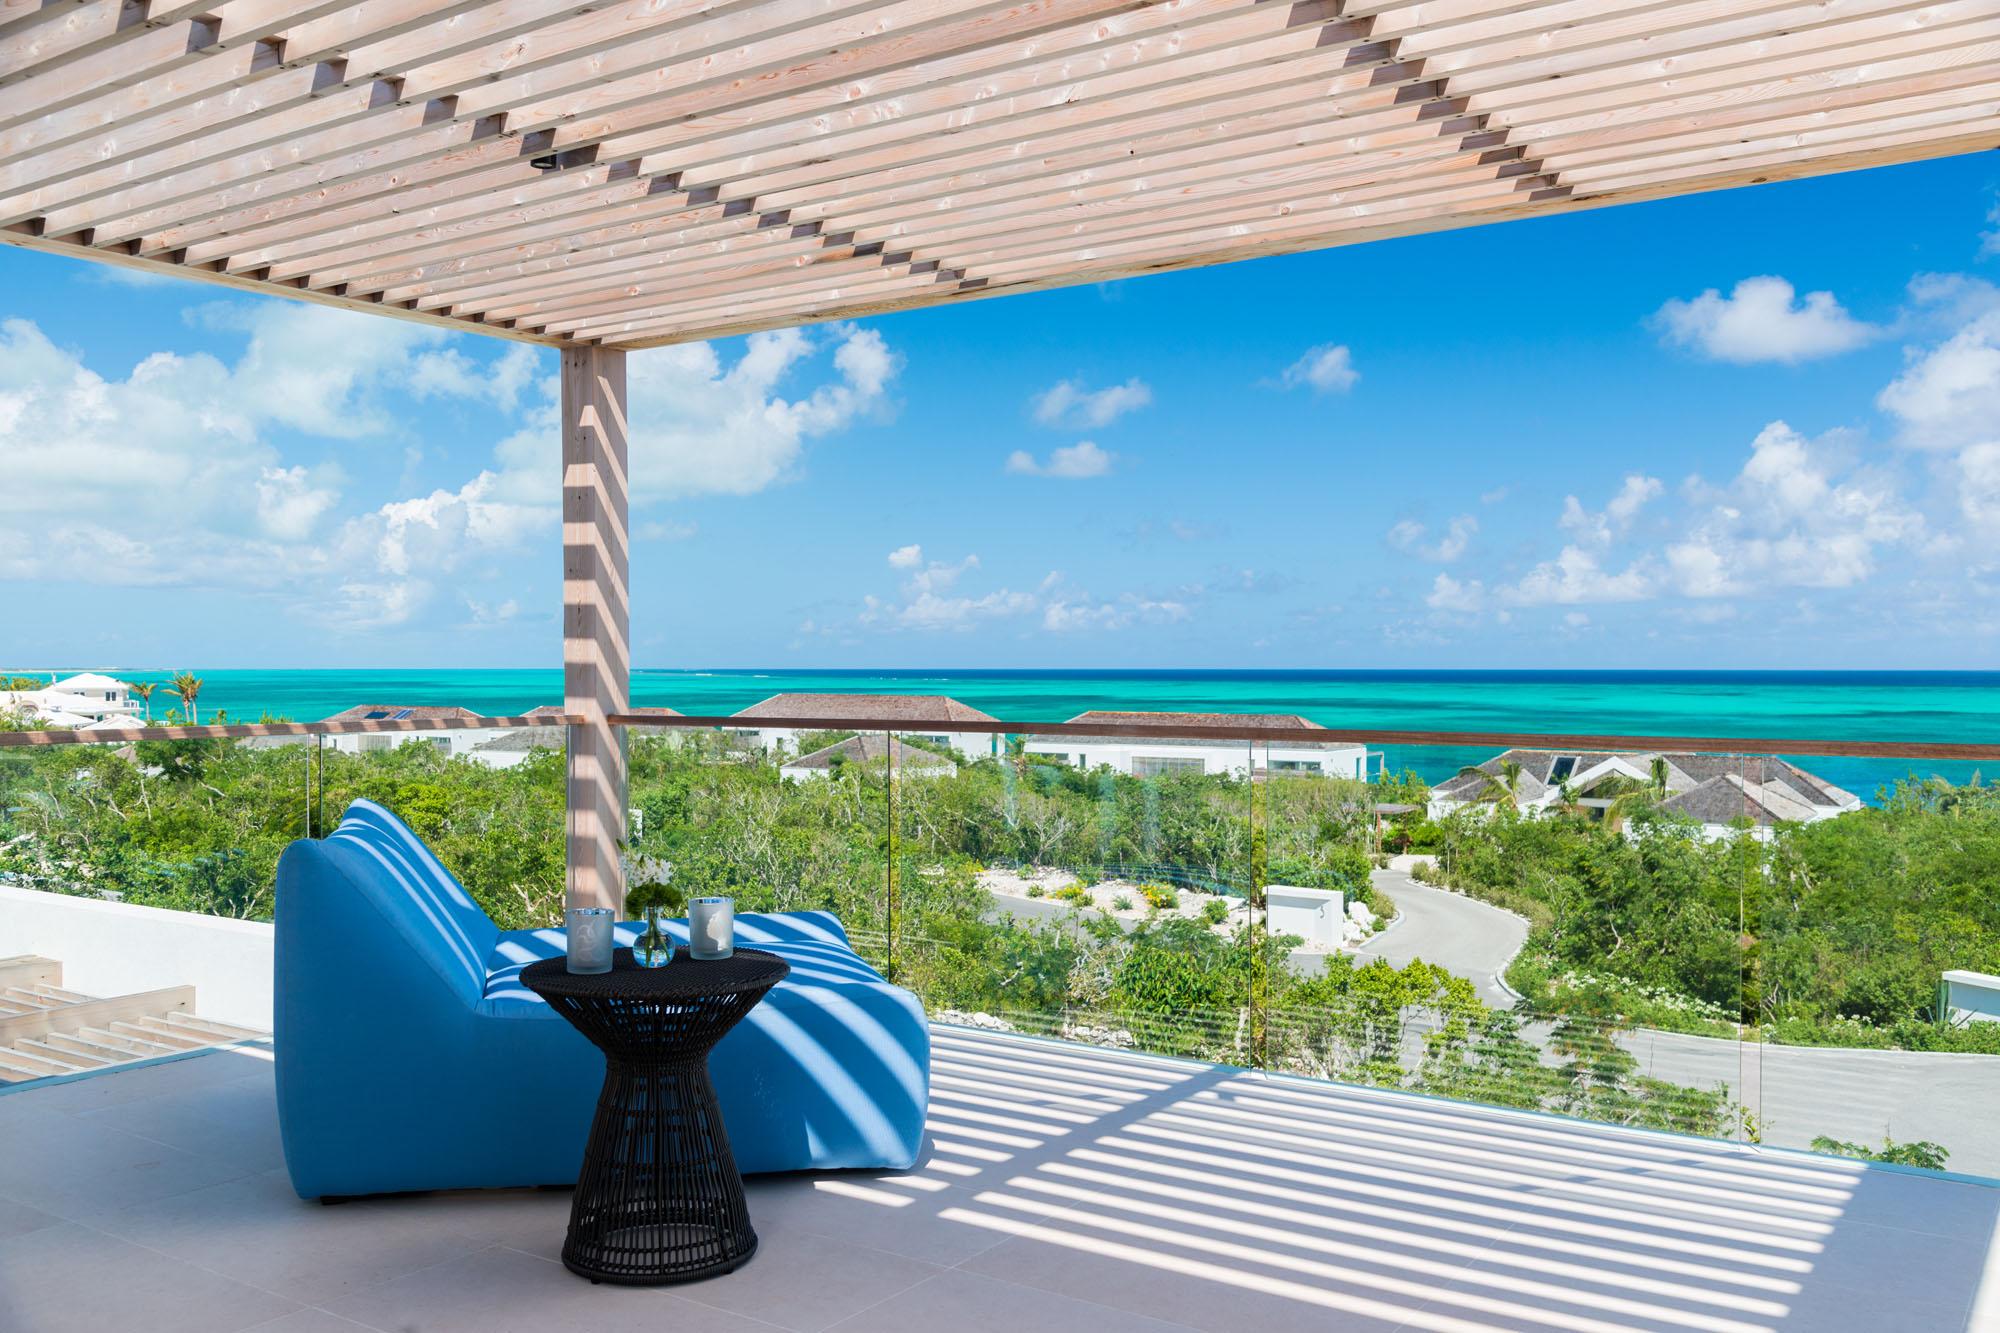 All bedrooms of these luxury Caribbean ocean view villas have en-suite bathrooms.